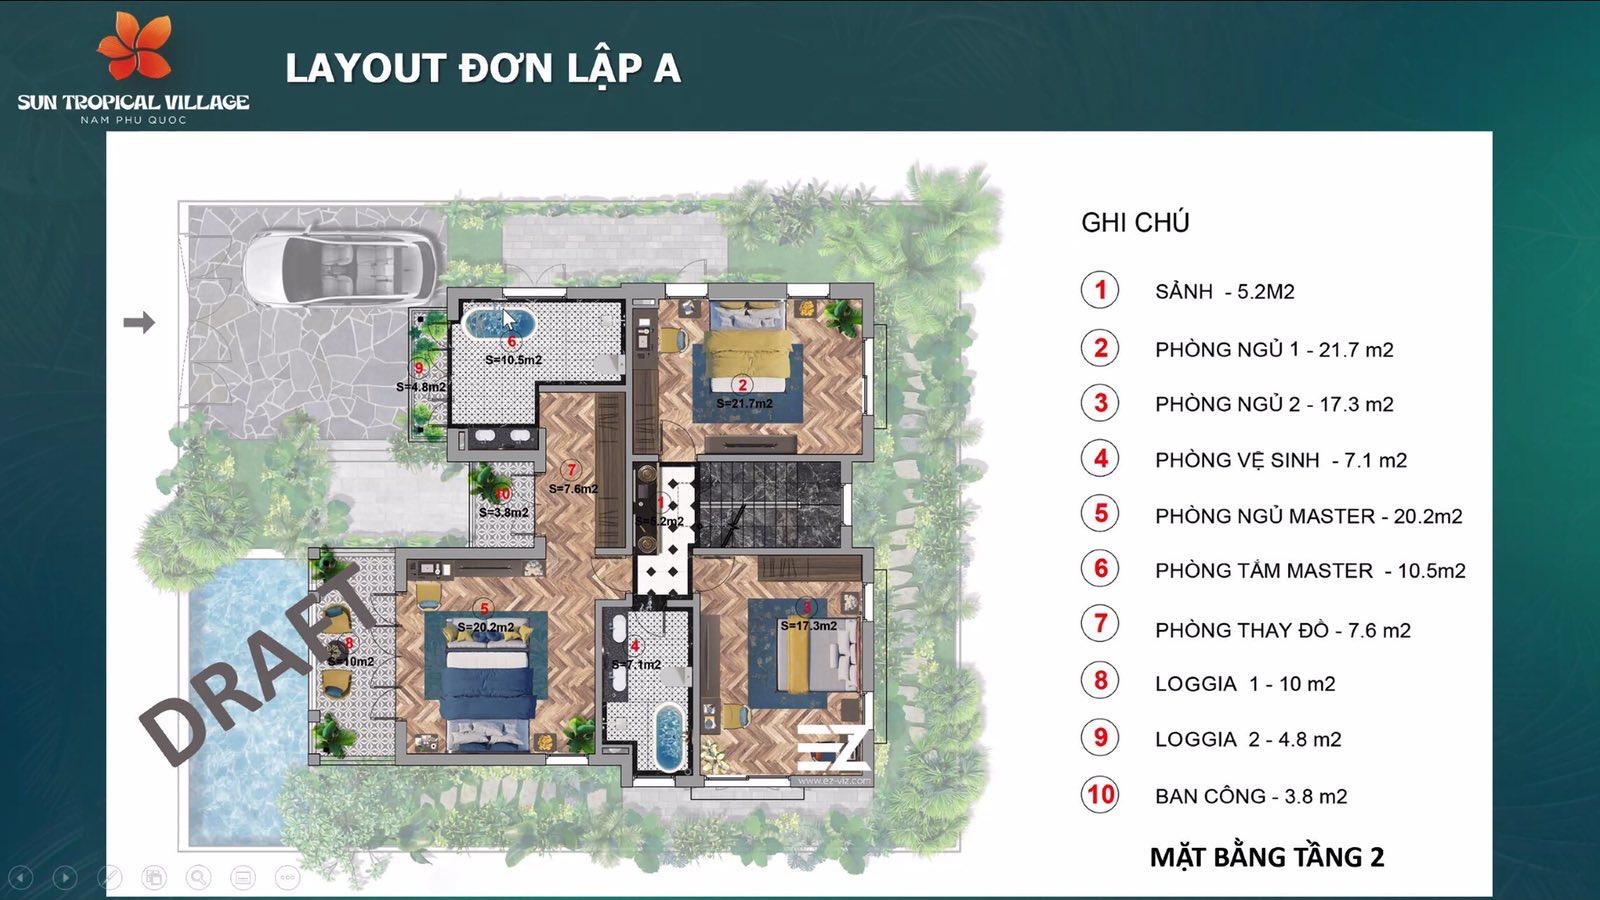 Layout biệt thự mẫu Sun Tropical Village Phú Quốc 3